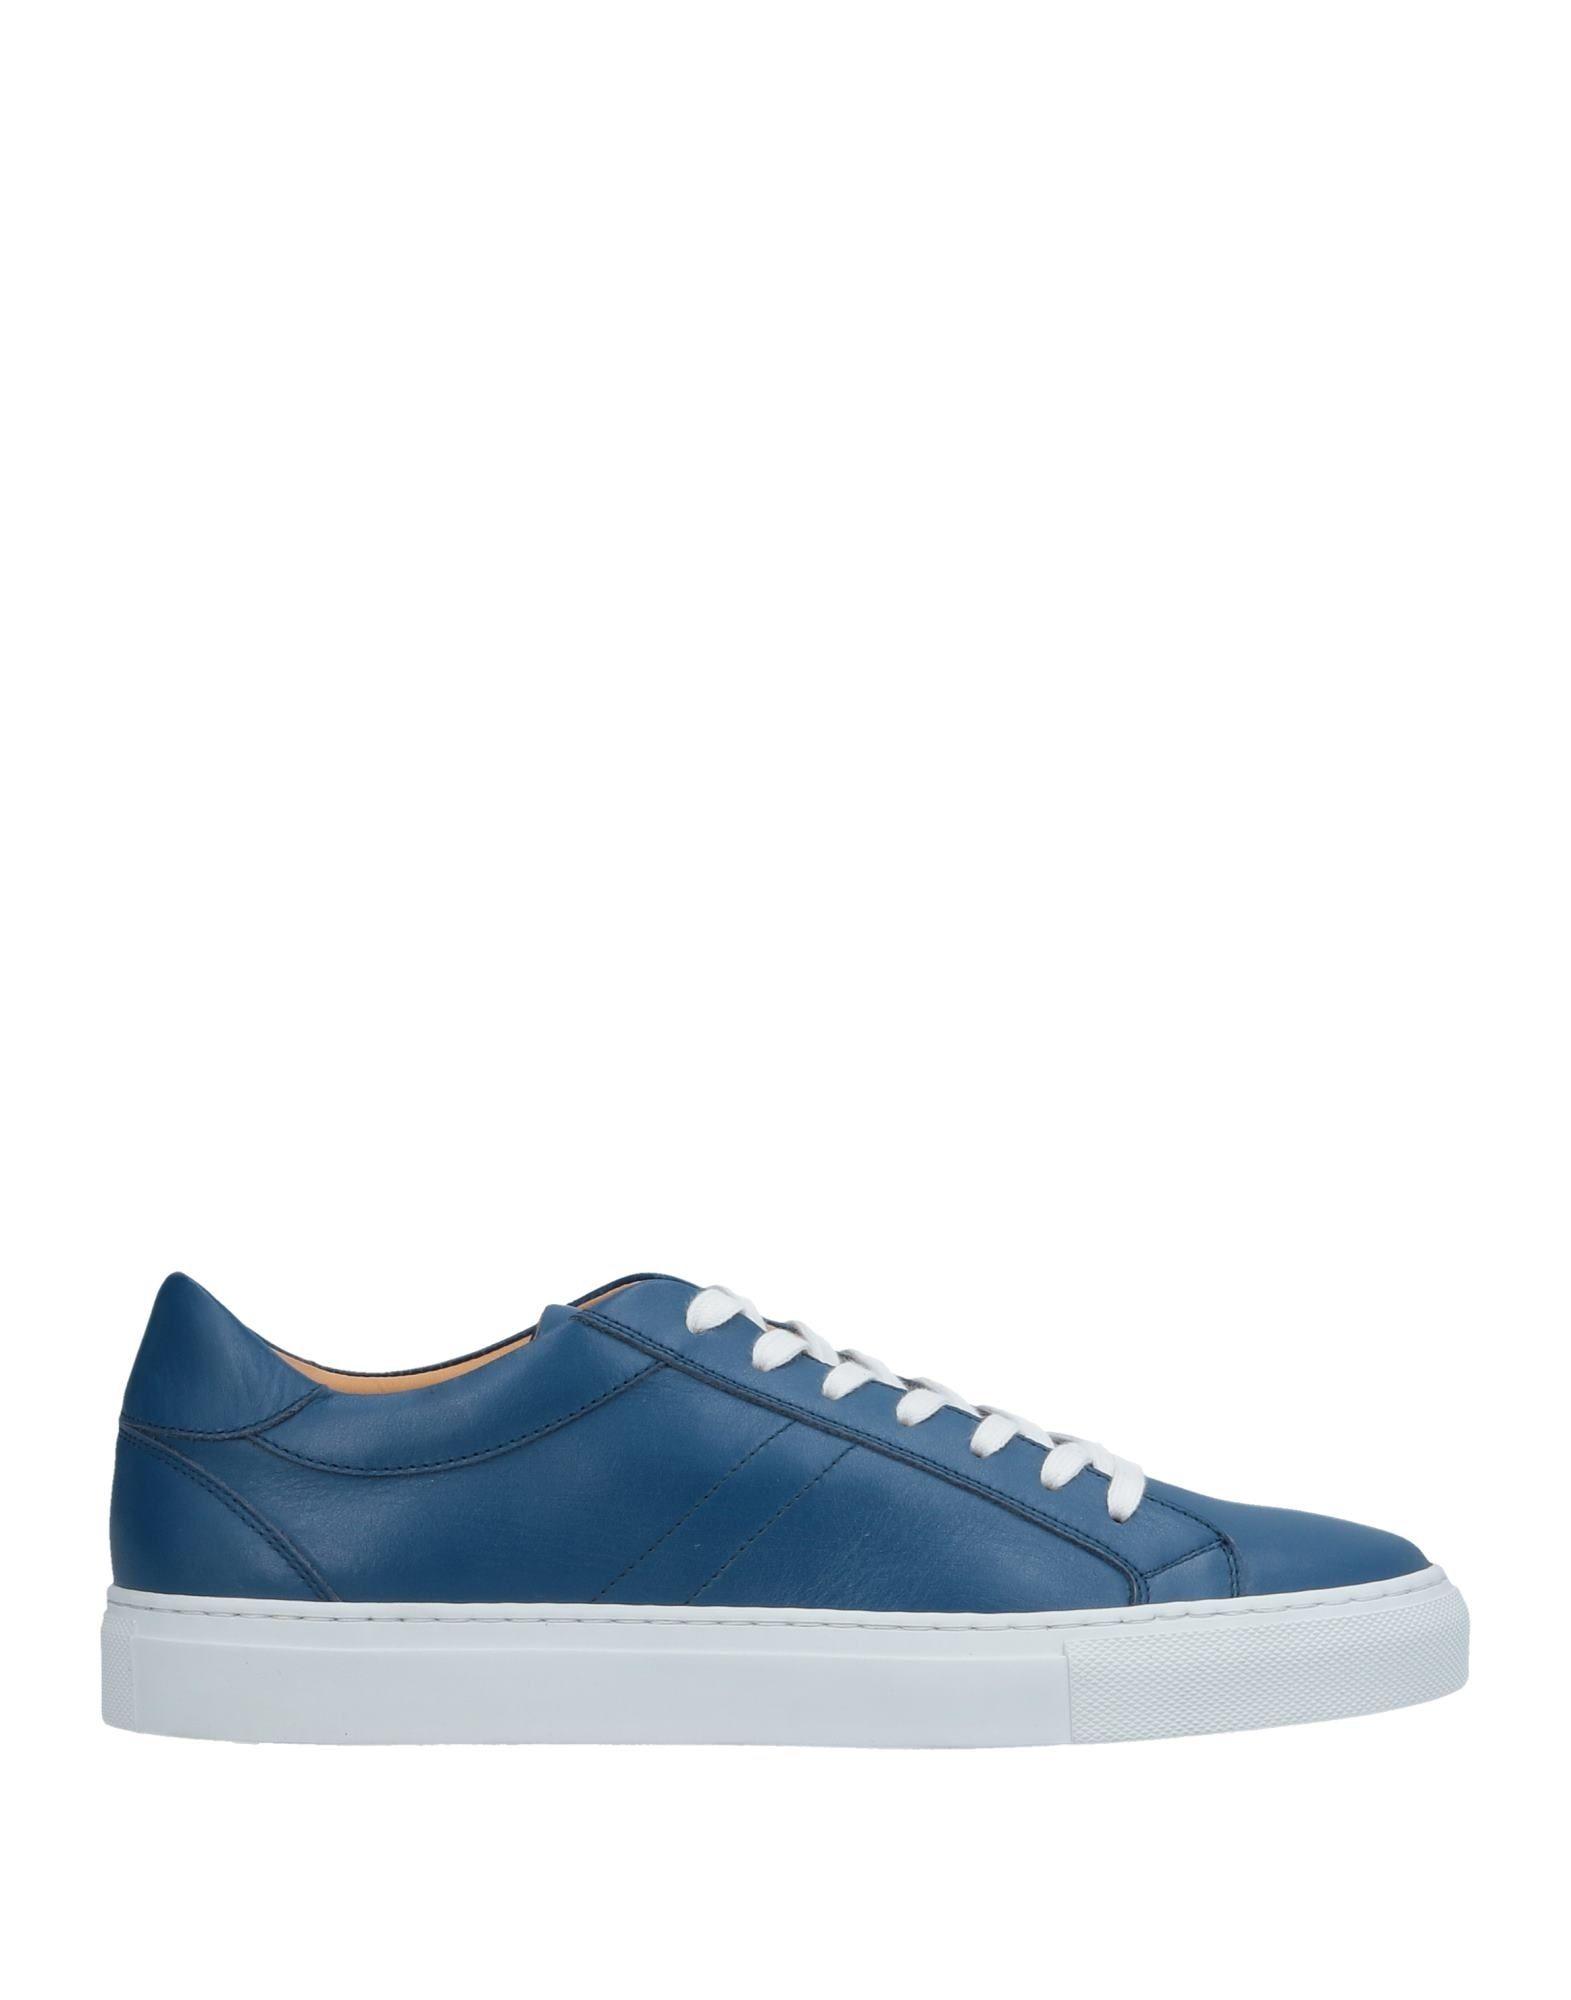 Rabatt echte Schuhe Herren Pellettieri Di  Parma Sneakers Herren Schuhe  11507972OV 446793